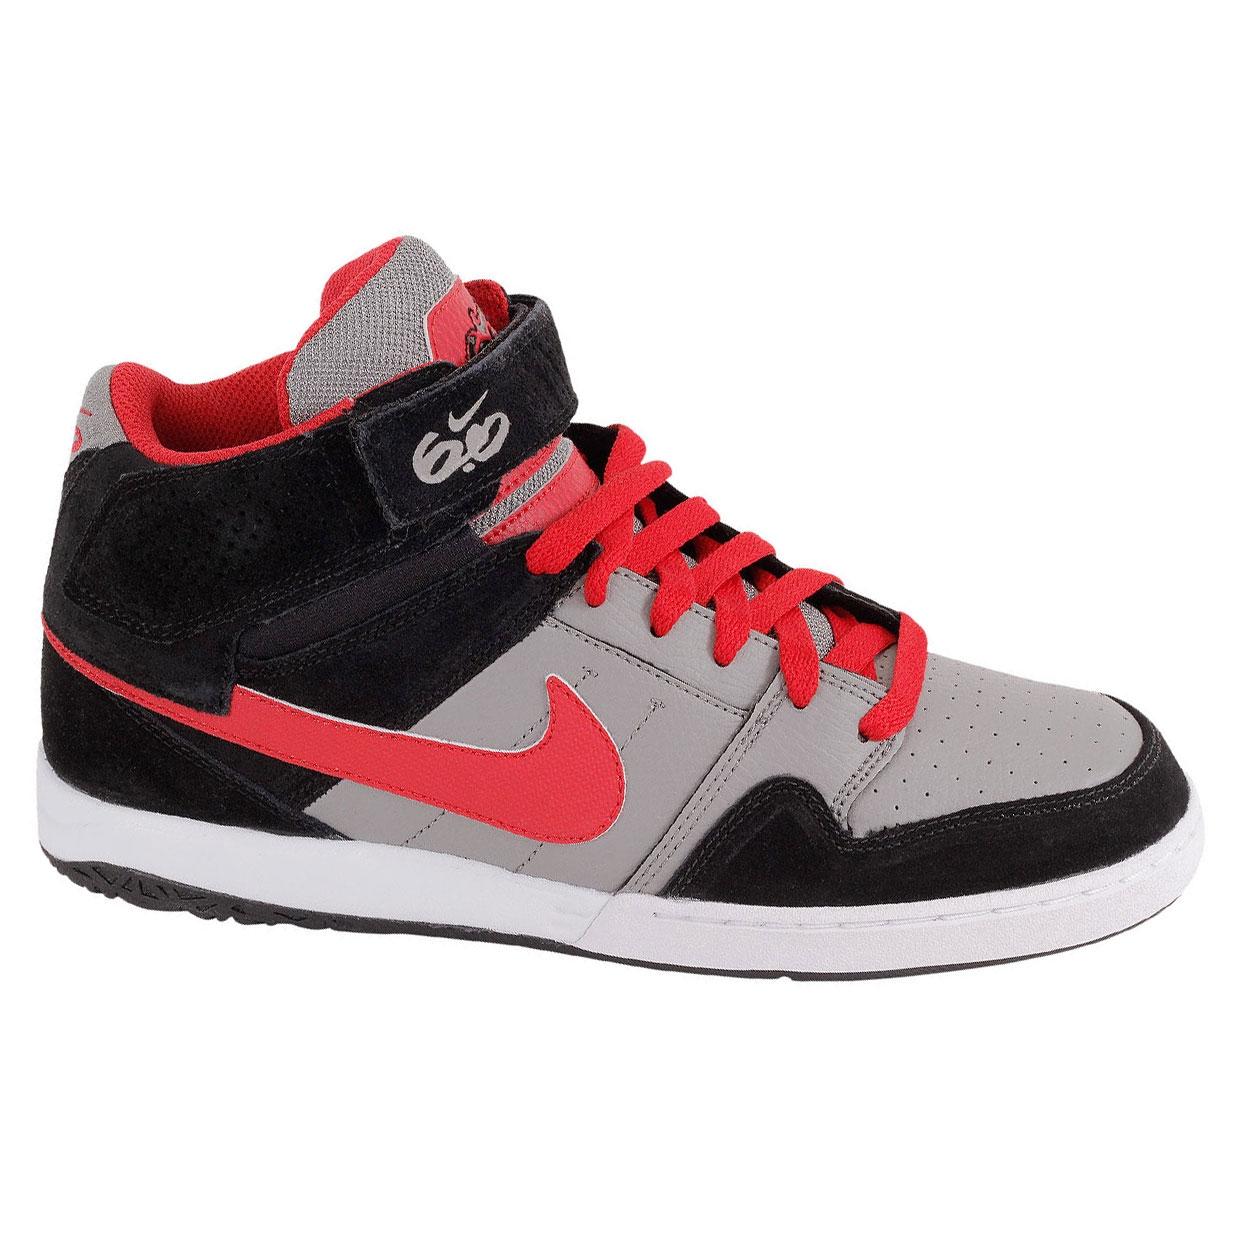 bd906ccb99a Nike 6.0 Zoom Mogan Mid 2 lt.charcoal red